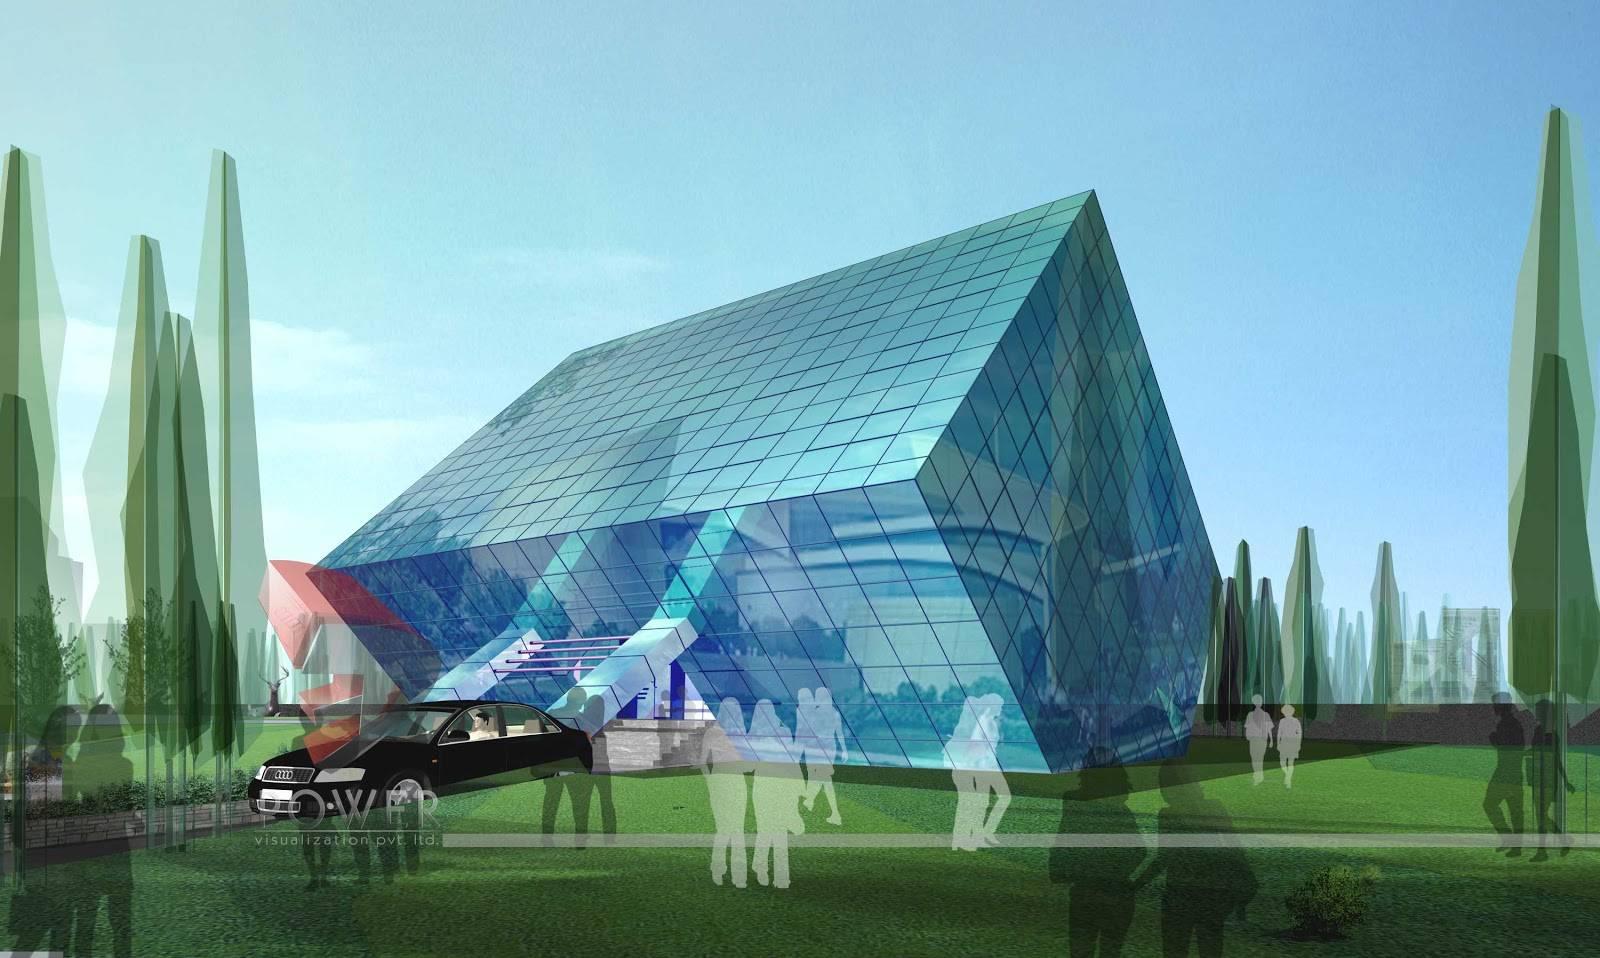 office building design architecture - Architectural Design Ideas